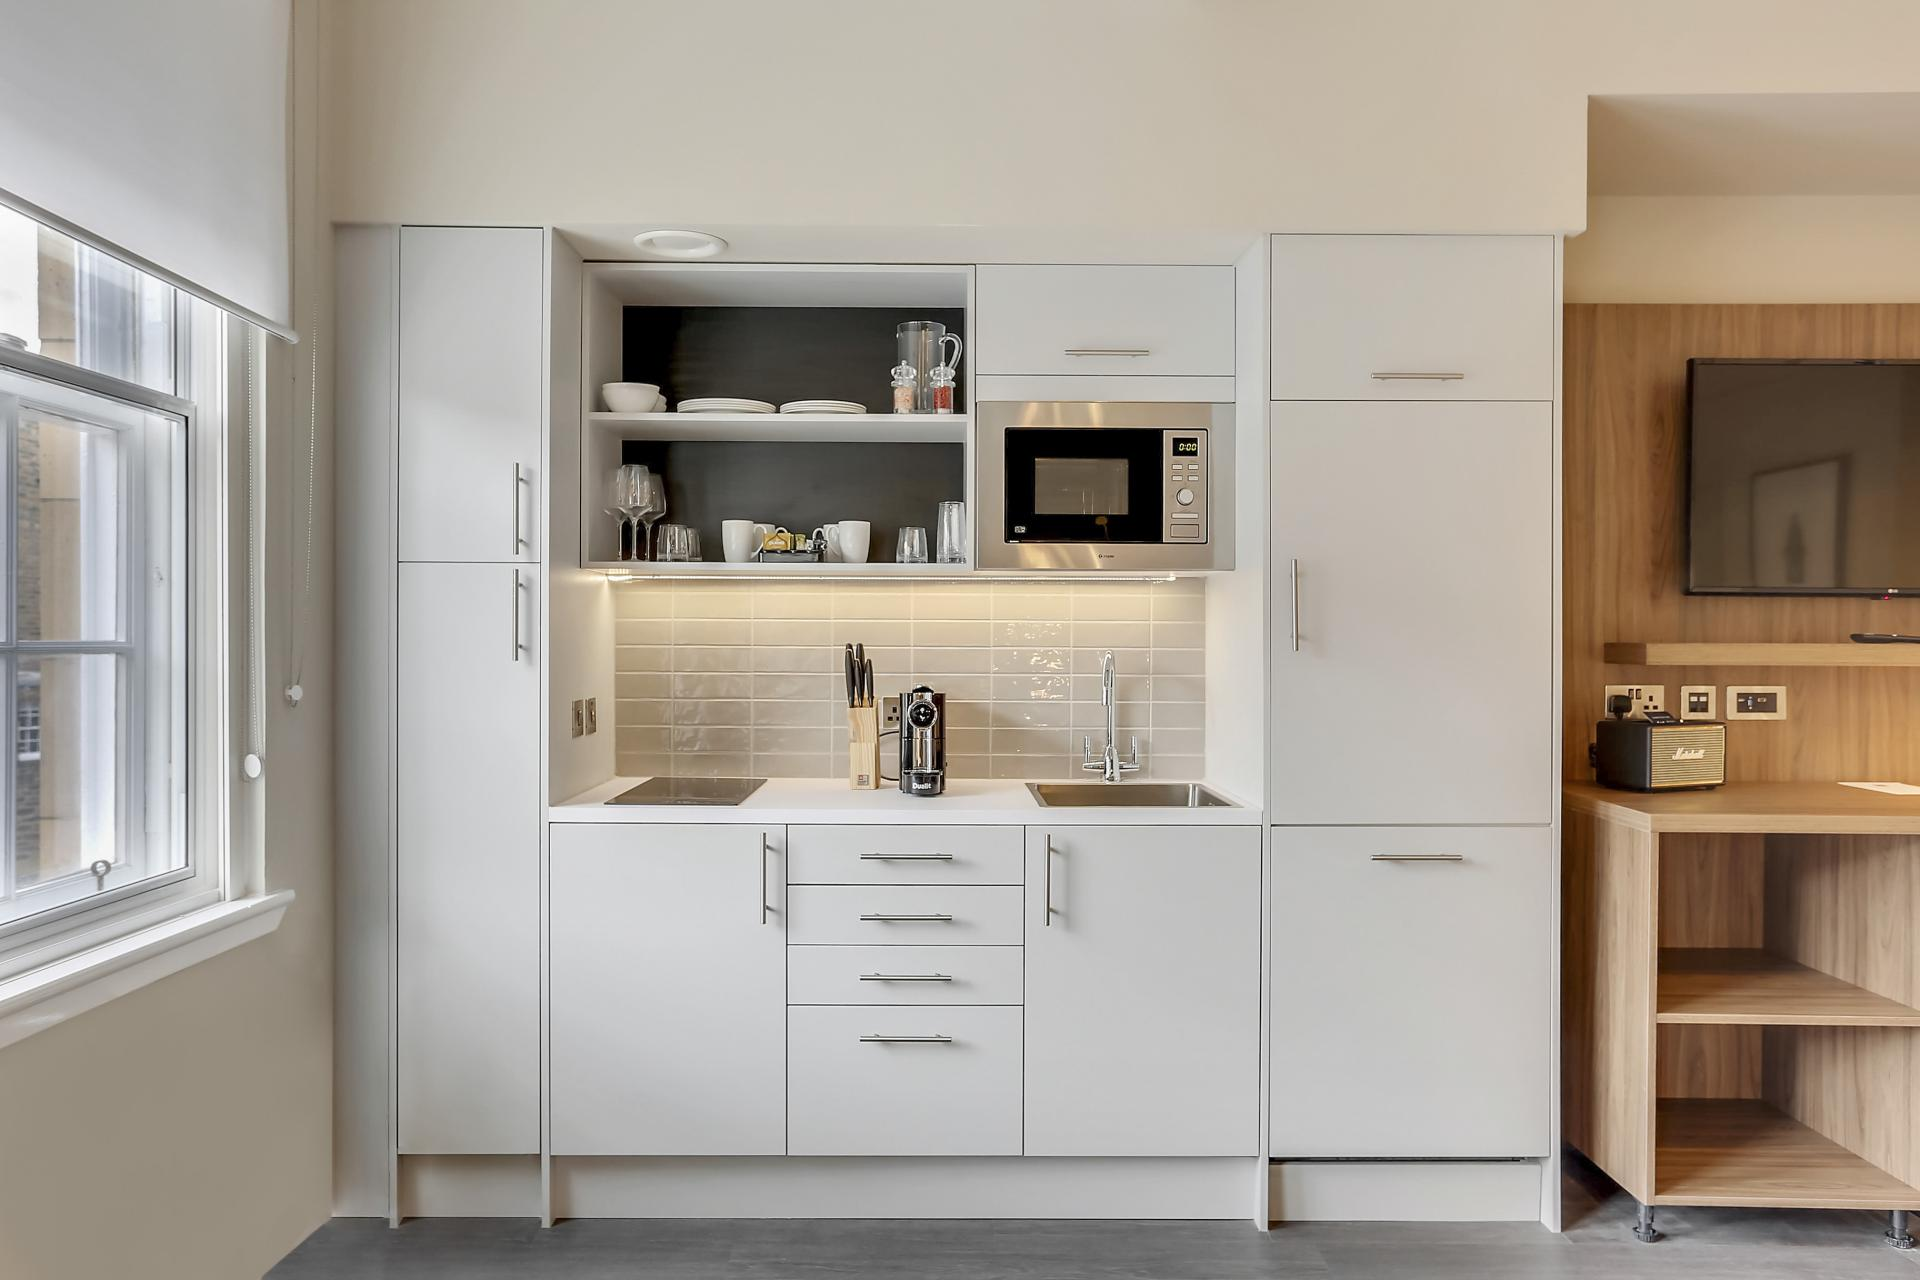 Kitchen at Native Edinburgh Apartments, Centre, Edinburgh - Citybase Apartments